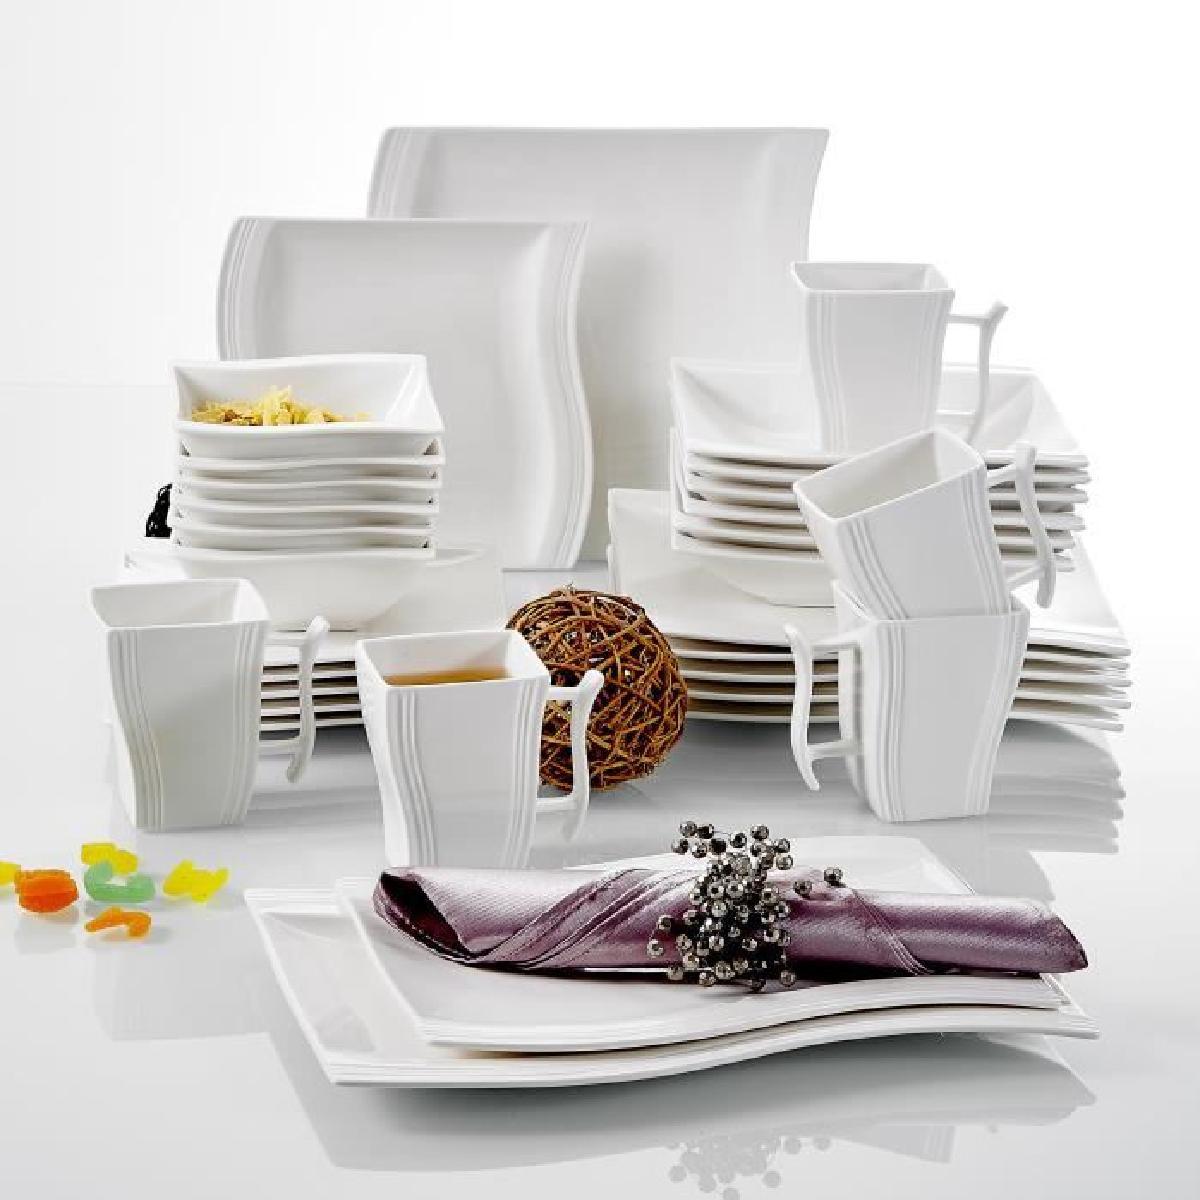 service de table pas cher design. Black Bedroom Furniture Sets. Home Design Ideas